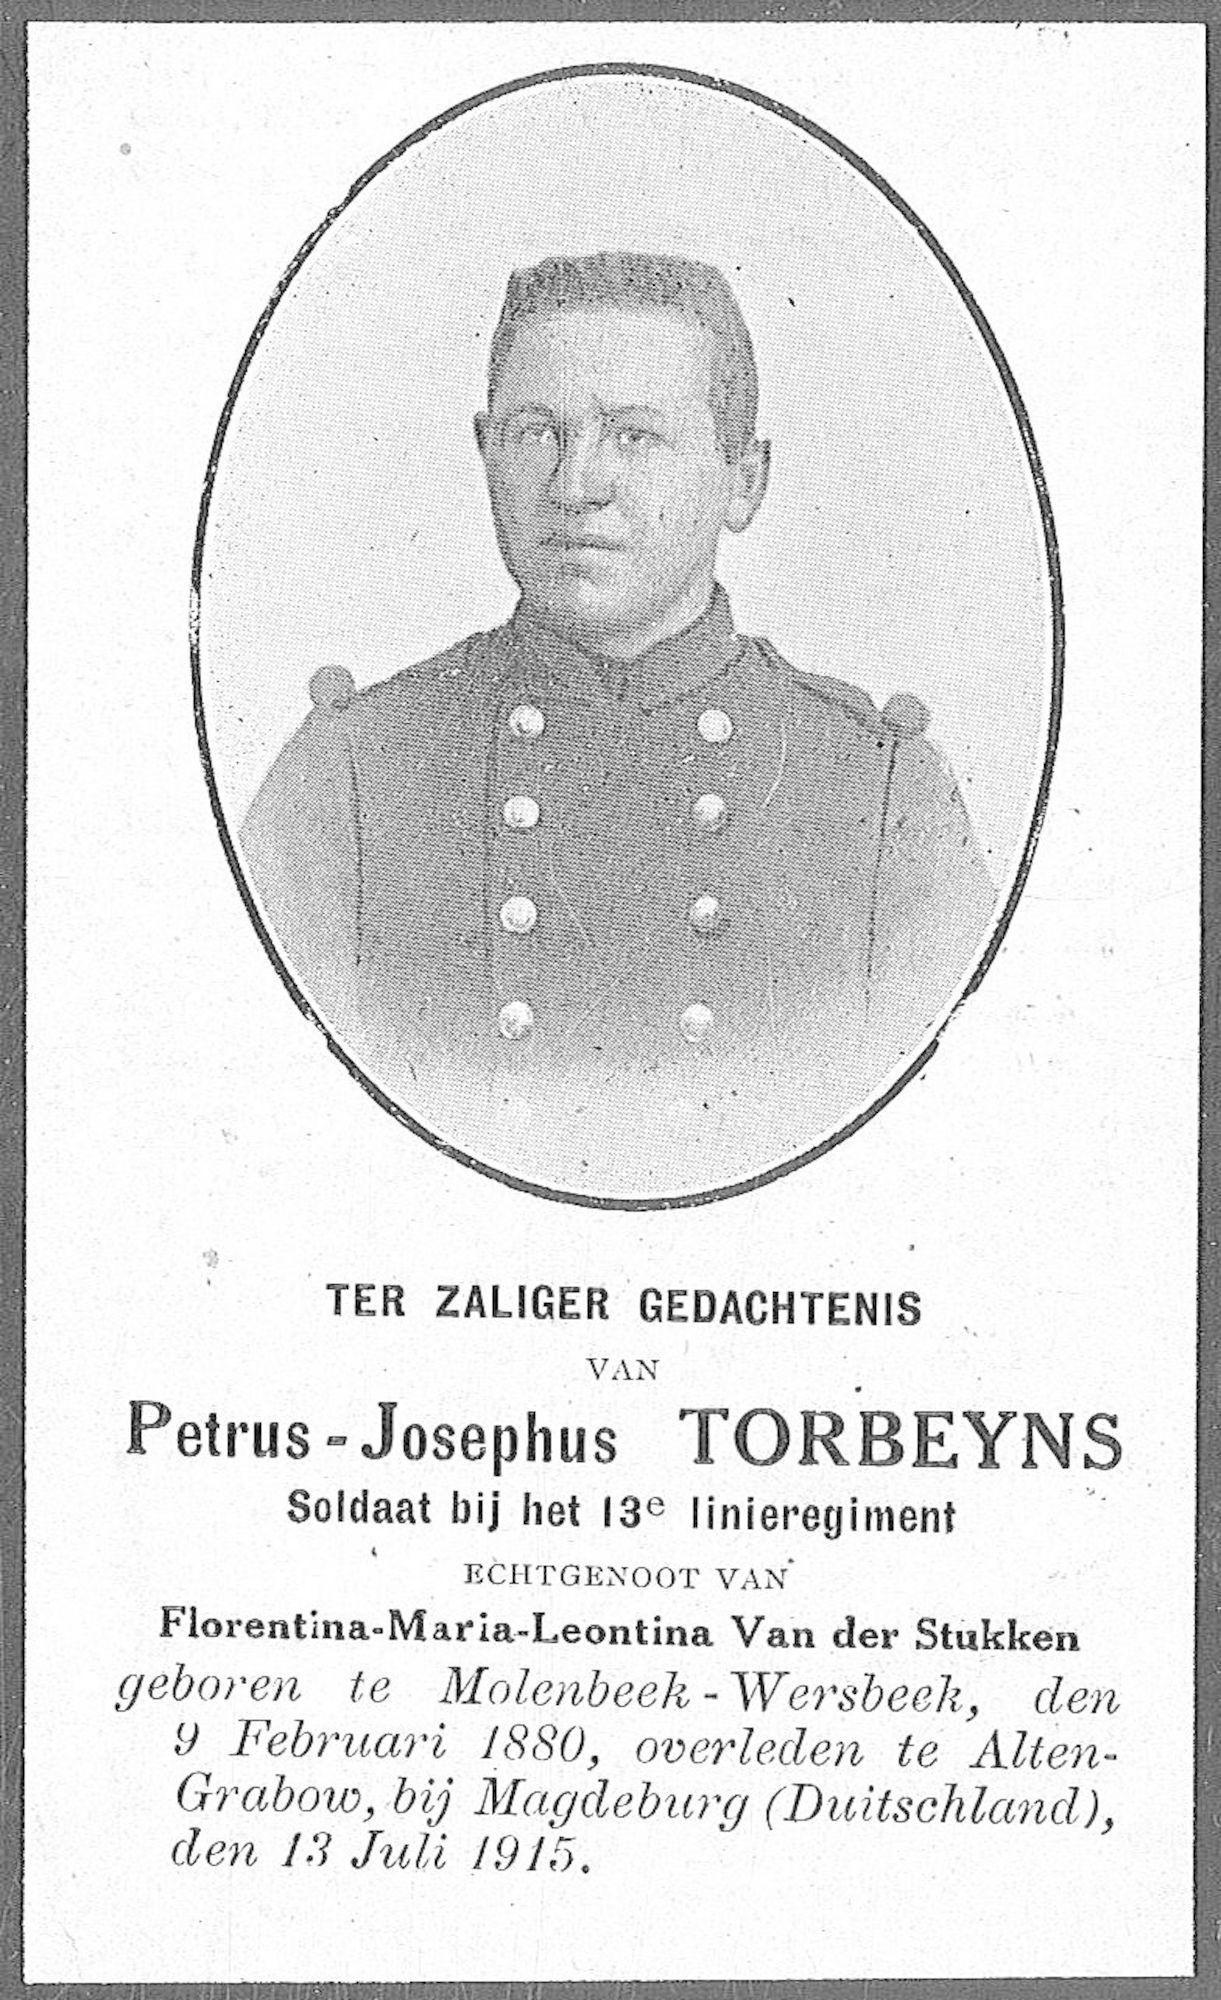 Torbeyns Petrus-Josephus